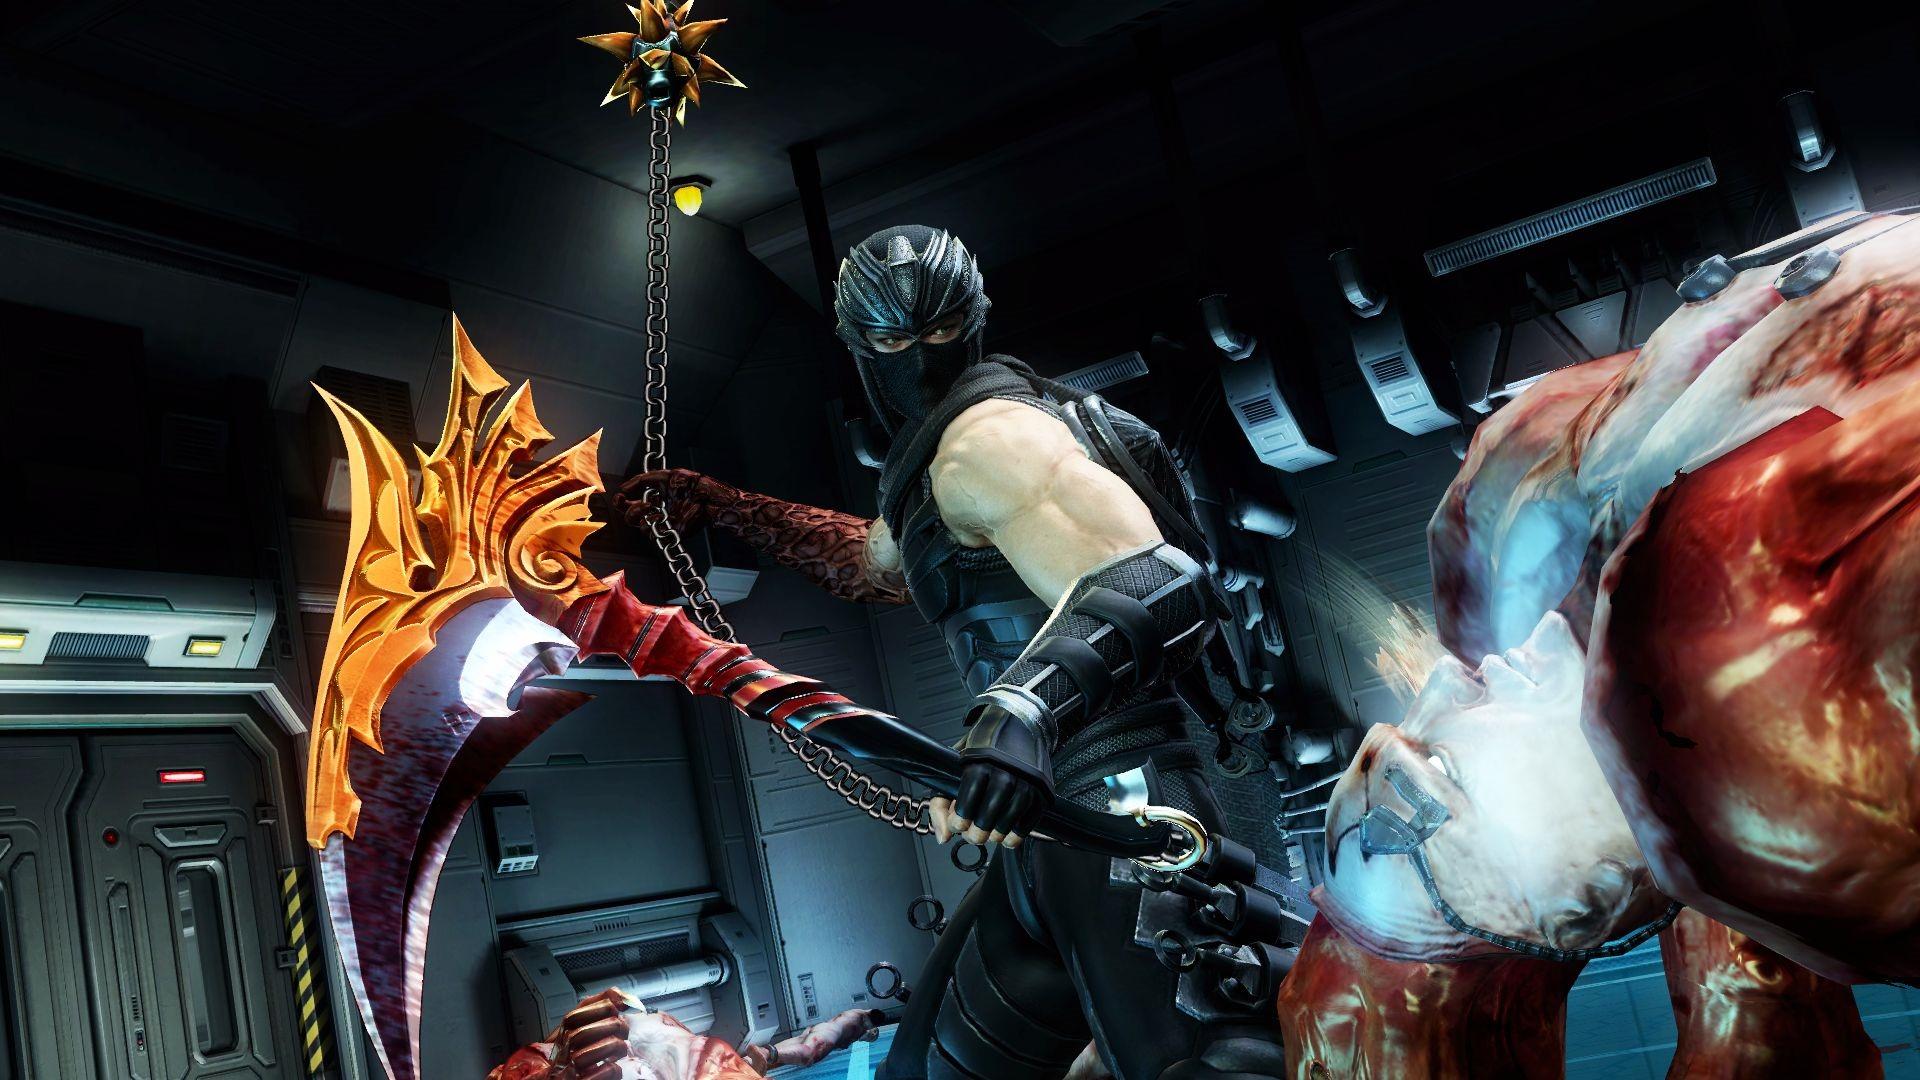 Team Ninja On Wii U Hardware Bringing Qte Free Ninja Gaiden 3 To